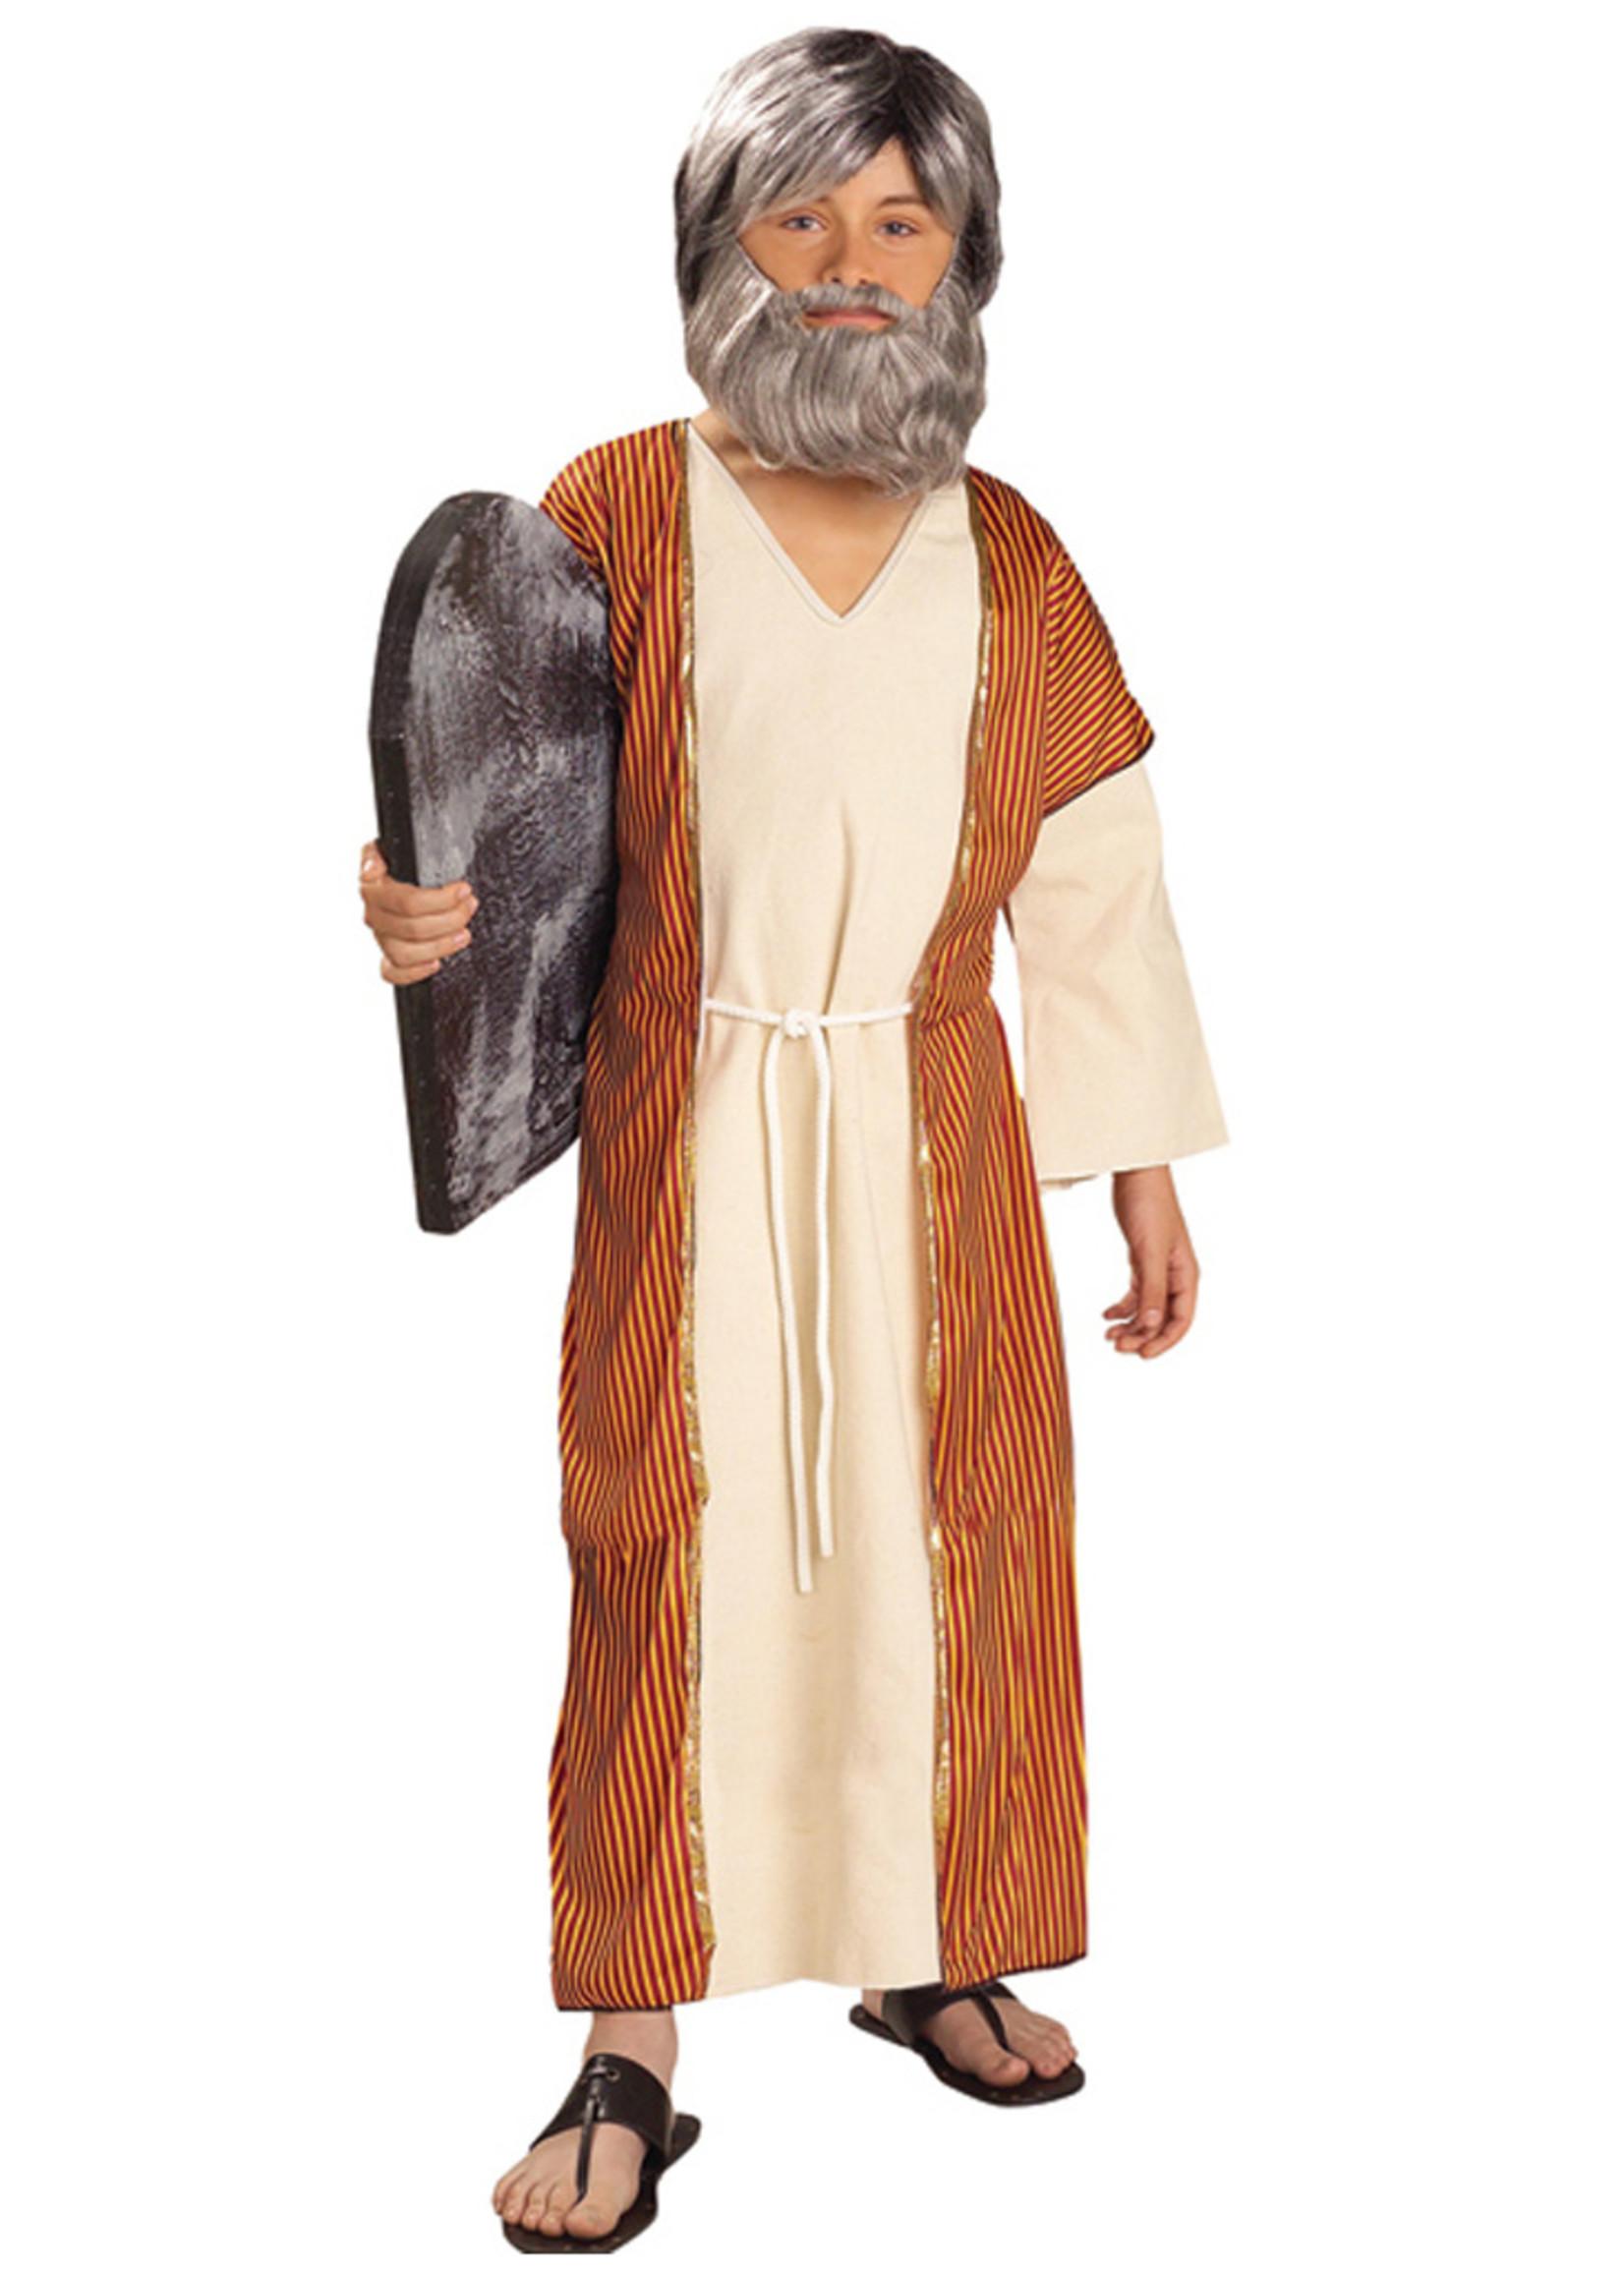 FORUM NOVELTIES Moses Costume - Boy's